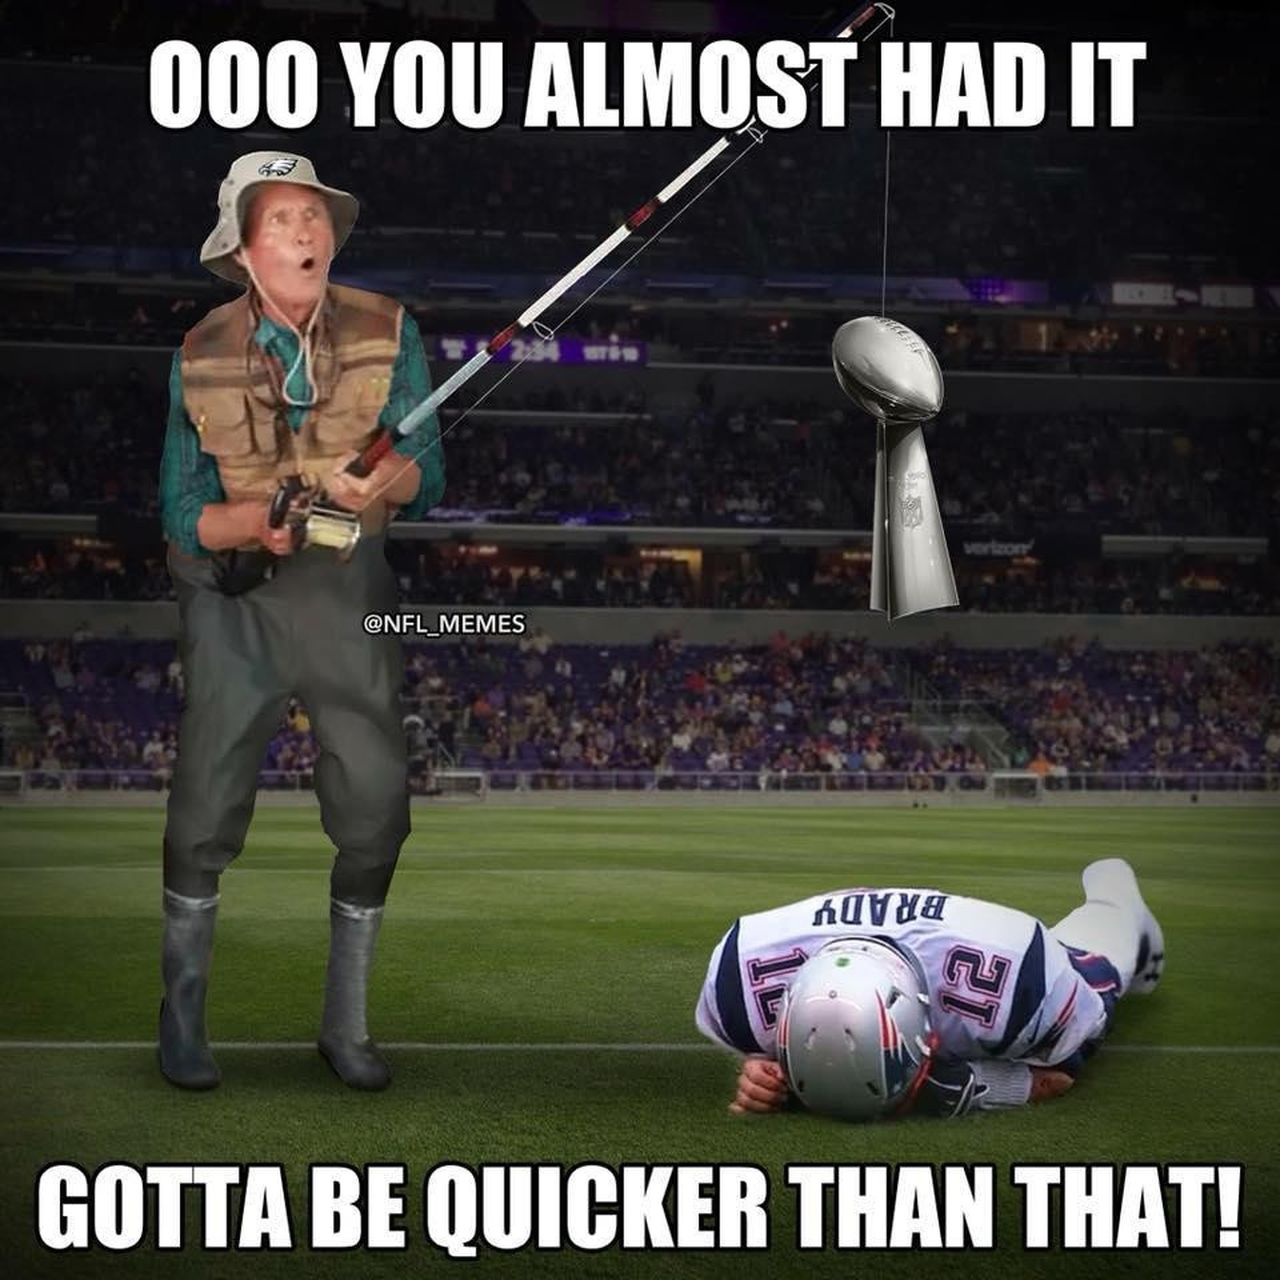 Fans Ridicule Sad Tom Brady New England Patriots With Hilarious